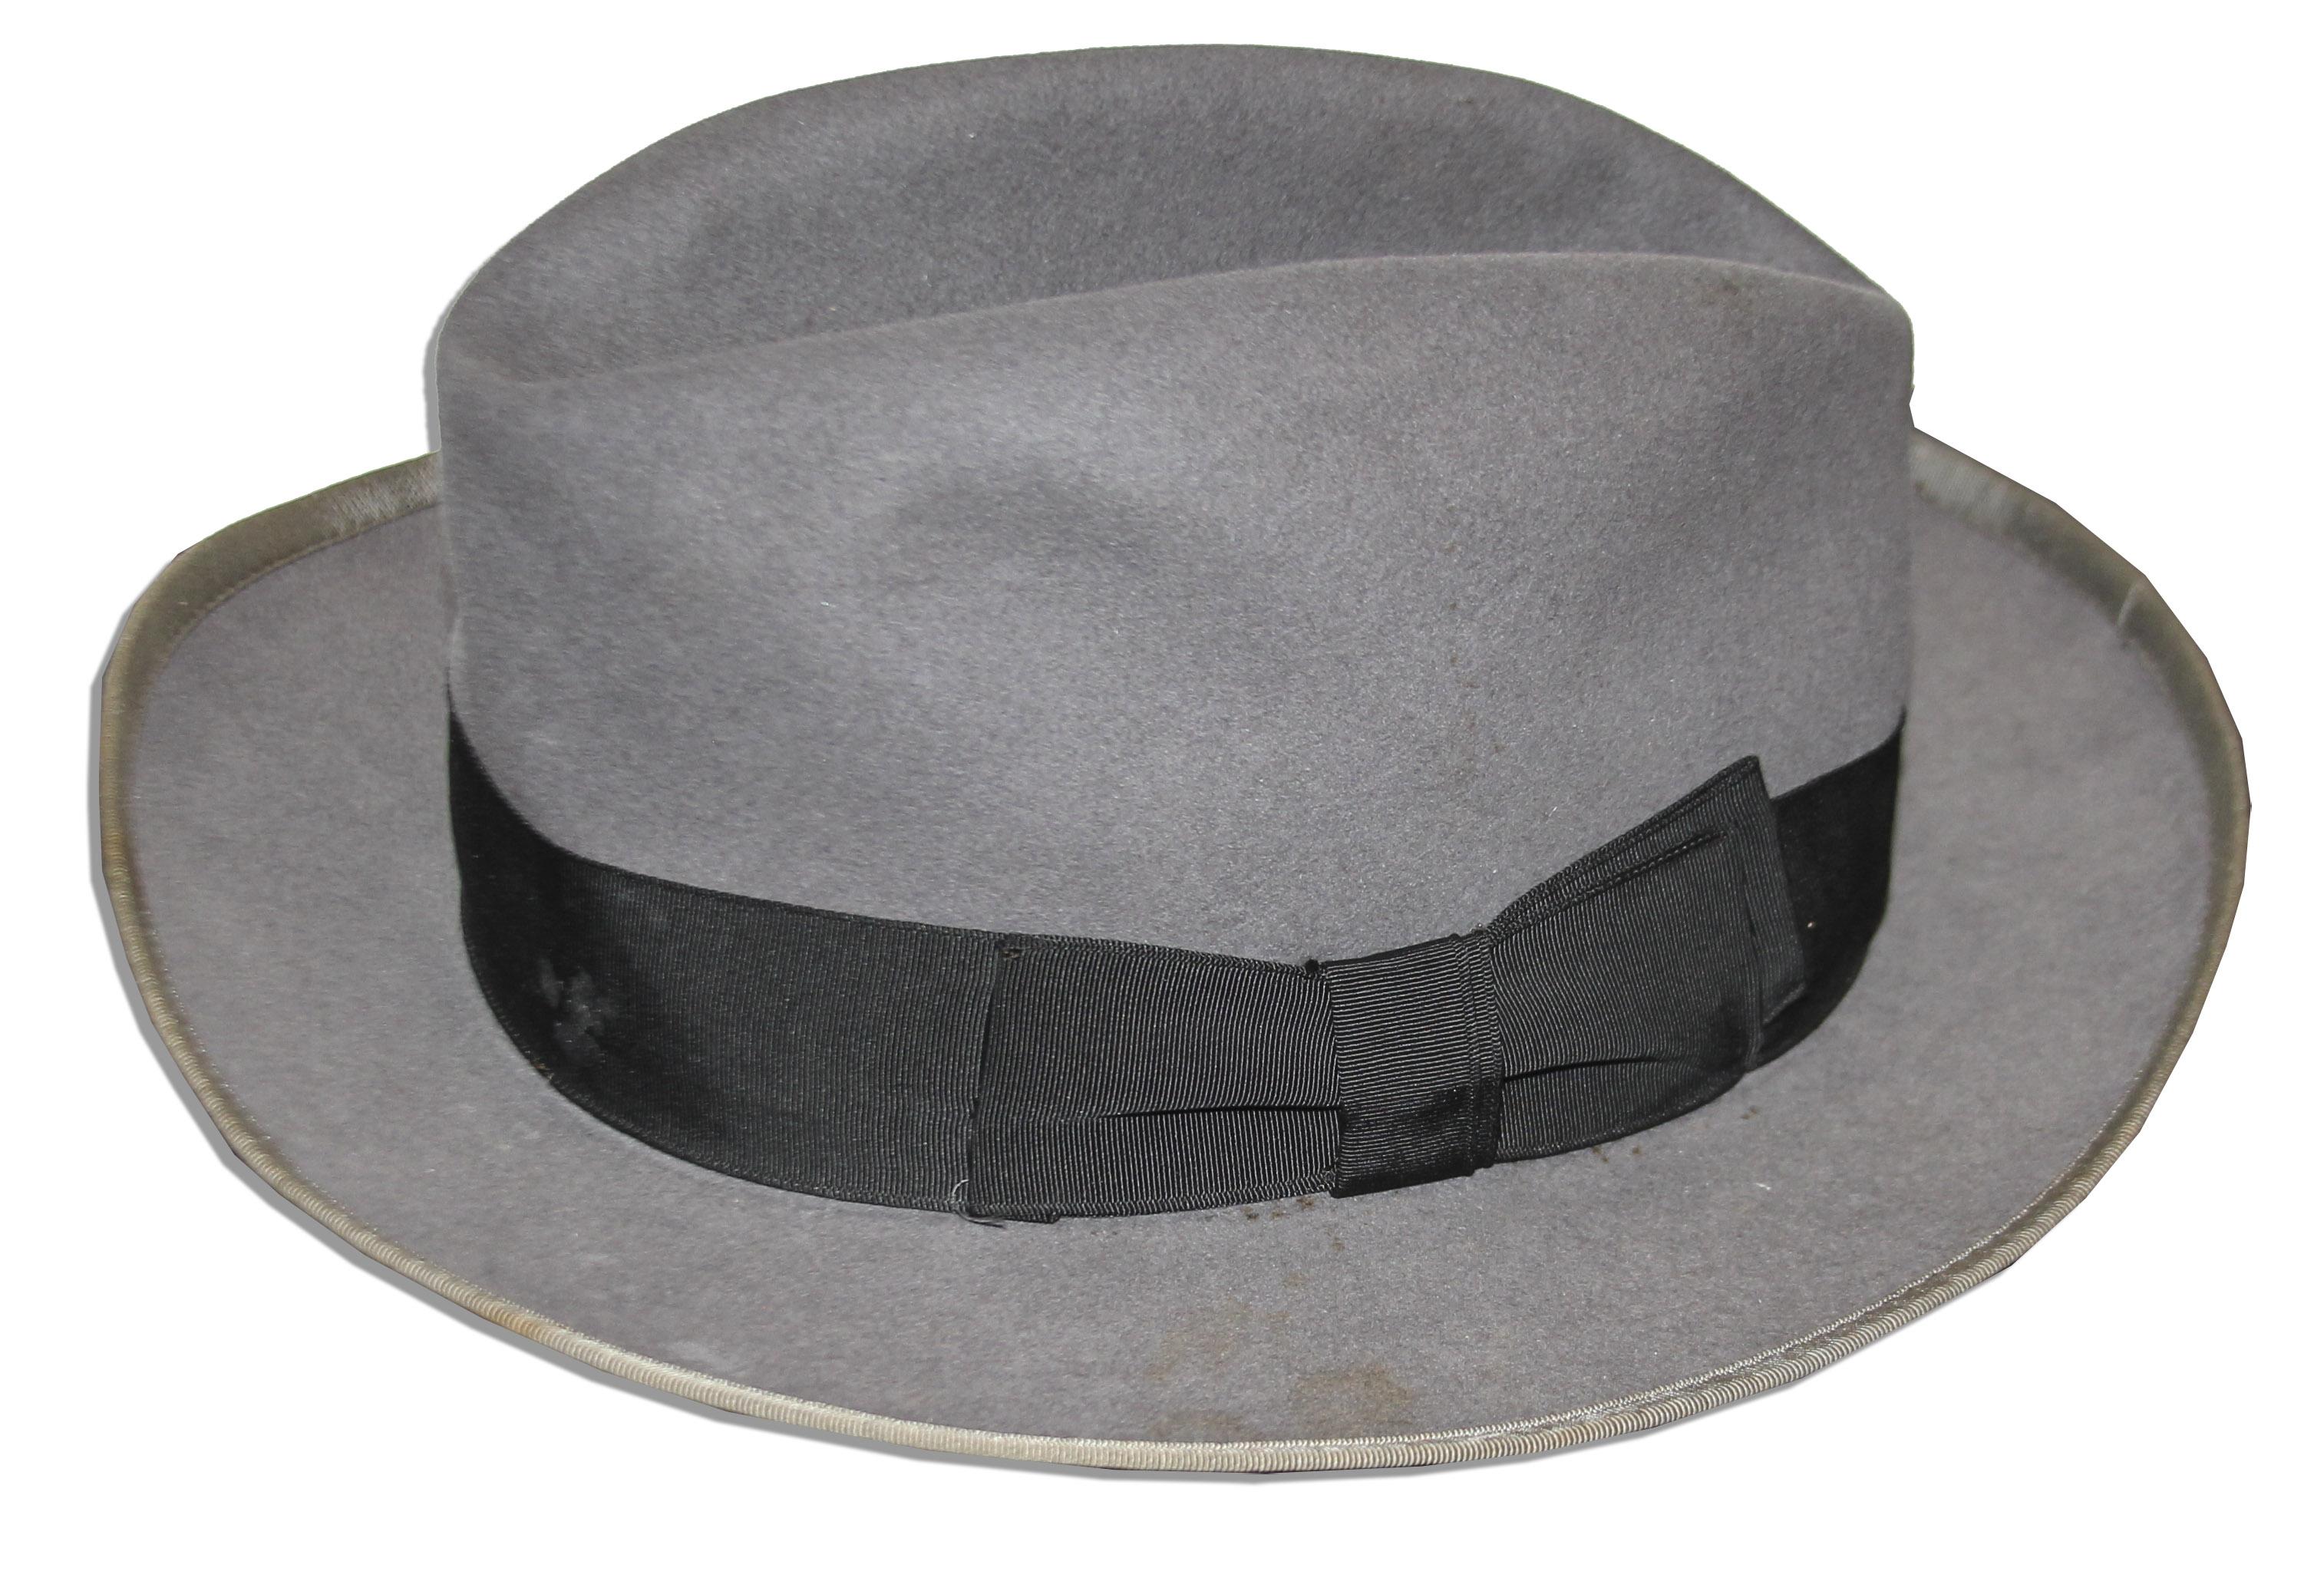 Marlon Brando Stetson Hat From His Role as Vito Corleone in   The Godfather  bf9a7f2fb88